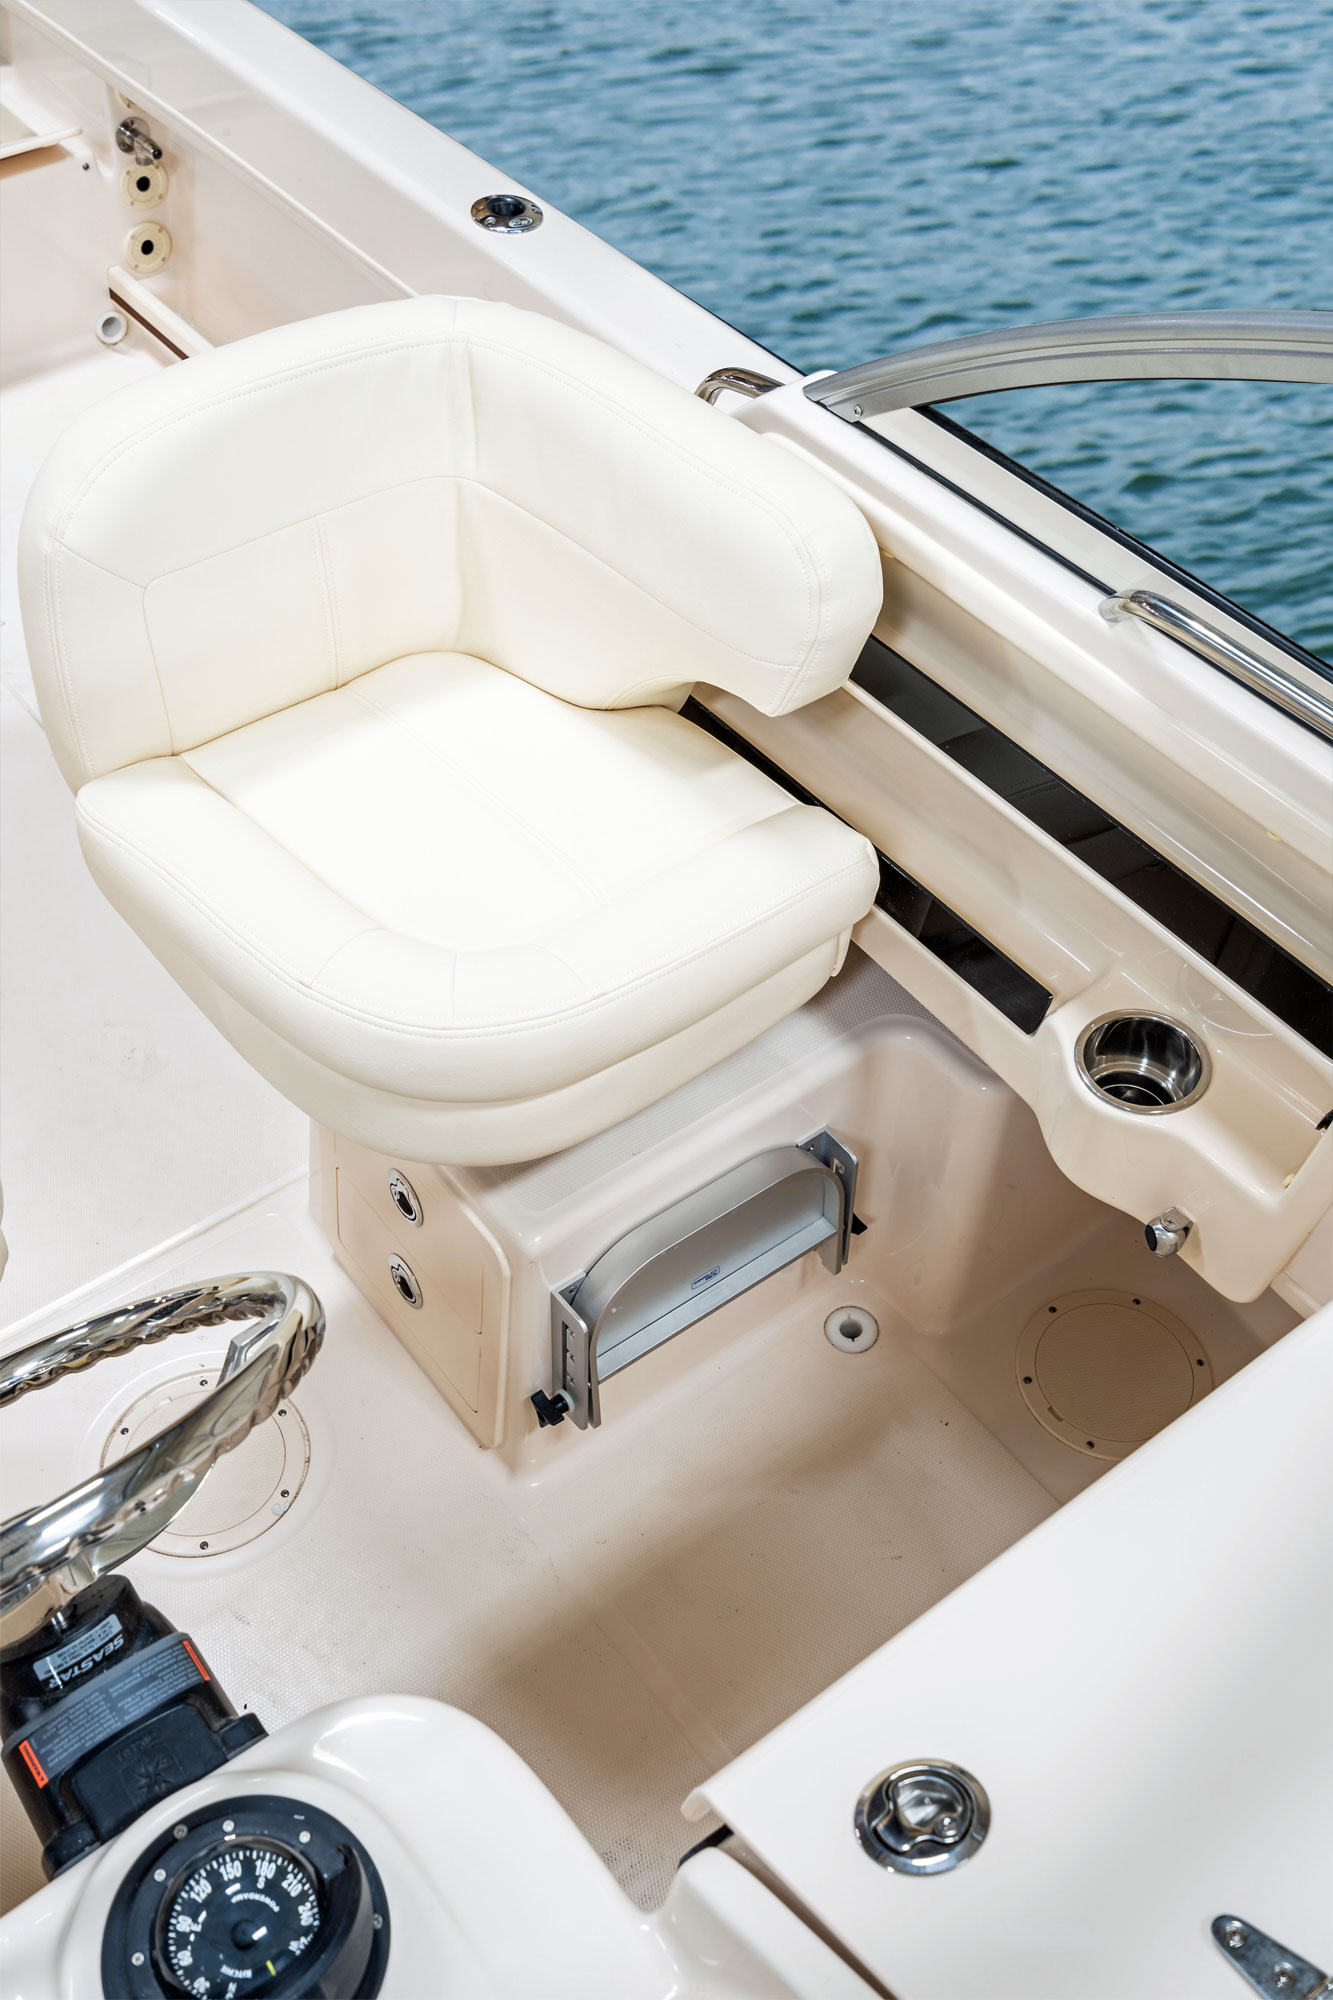 Adventure 208 Grady White 20 Walkaround Cabin Boat Companion Bench Seat